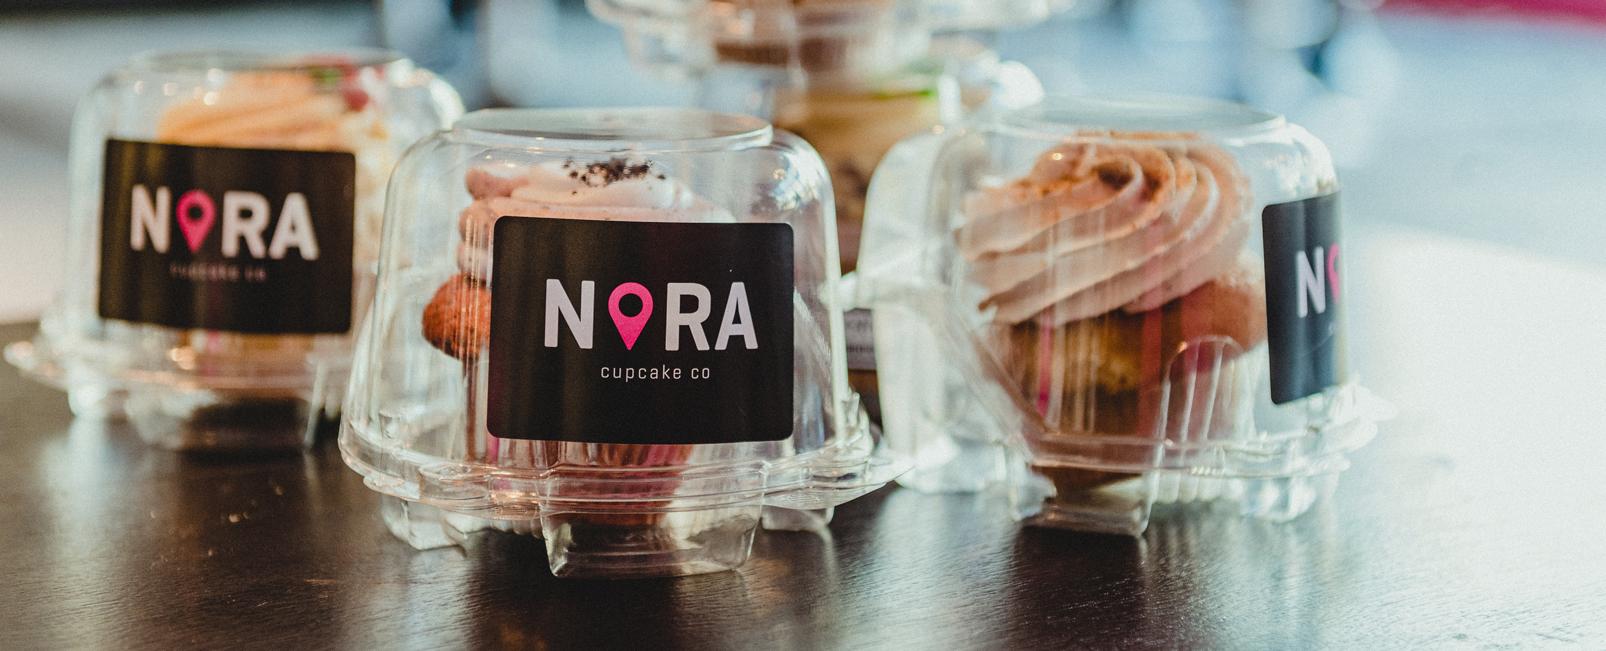 Nora Cupcakes